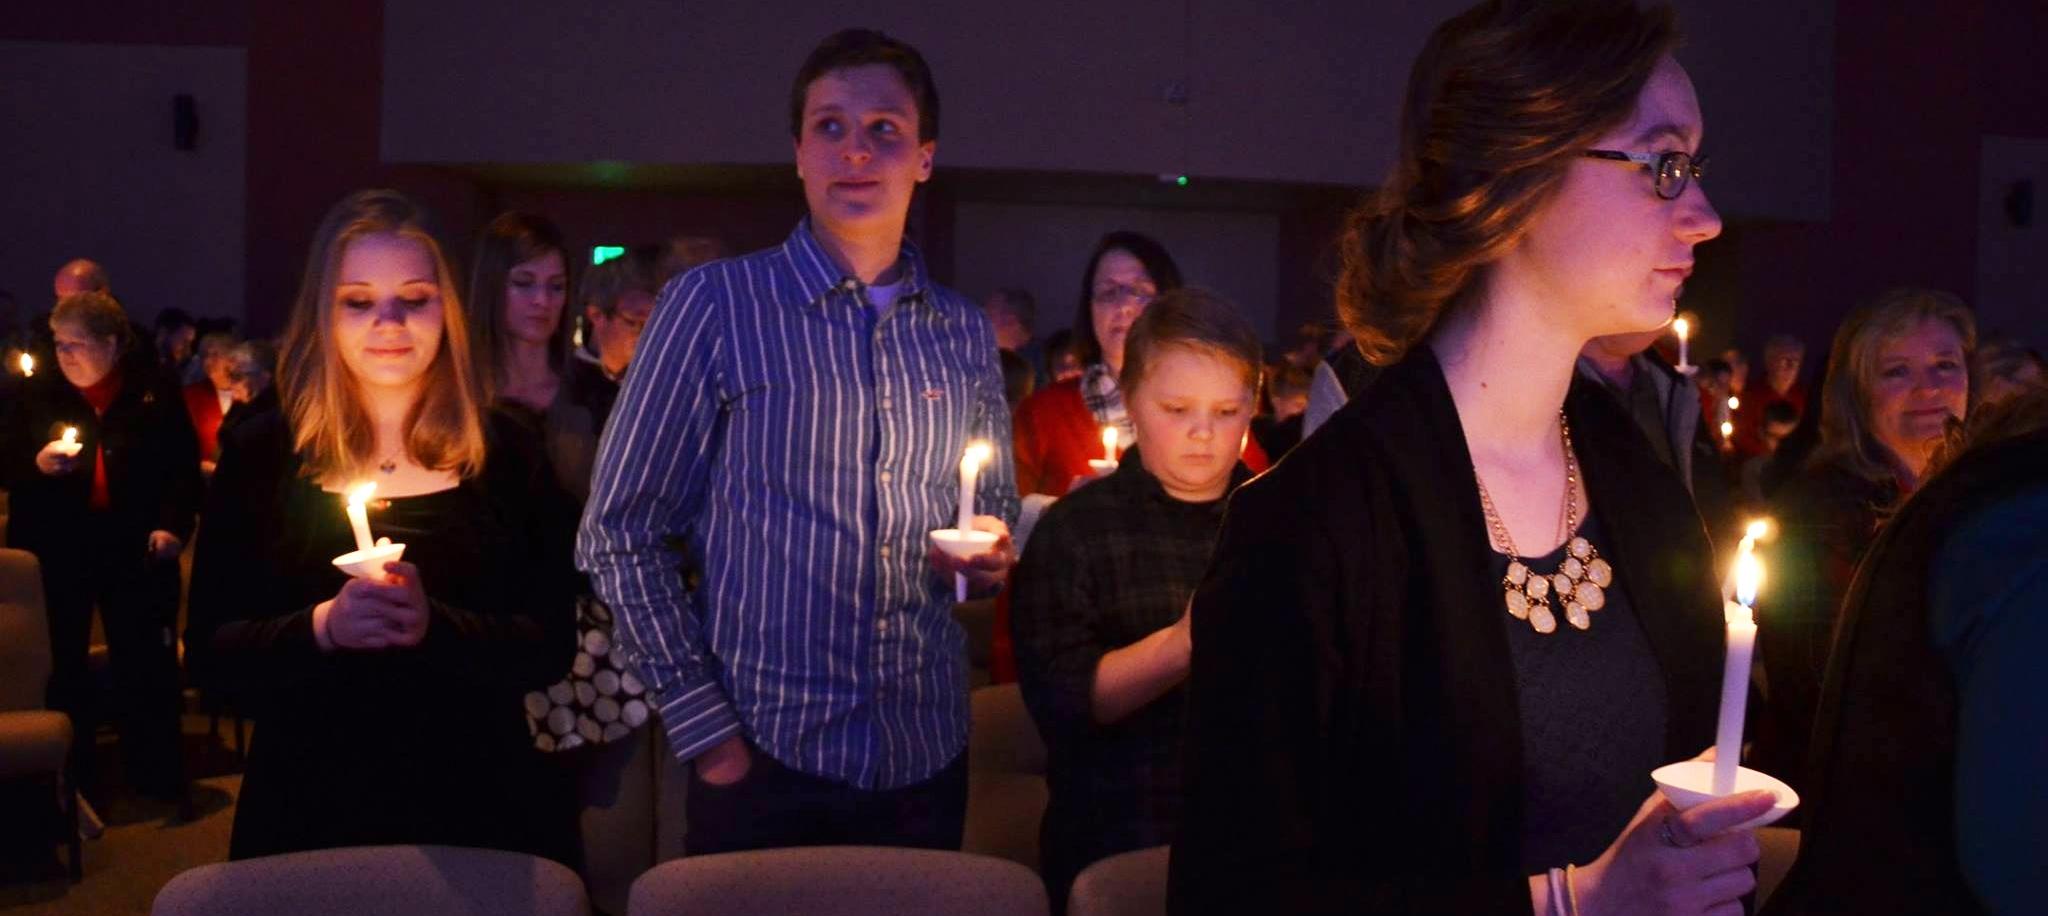 candlelightcongregation.jpg